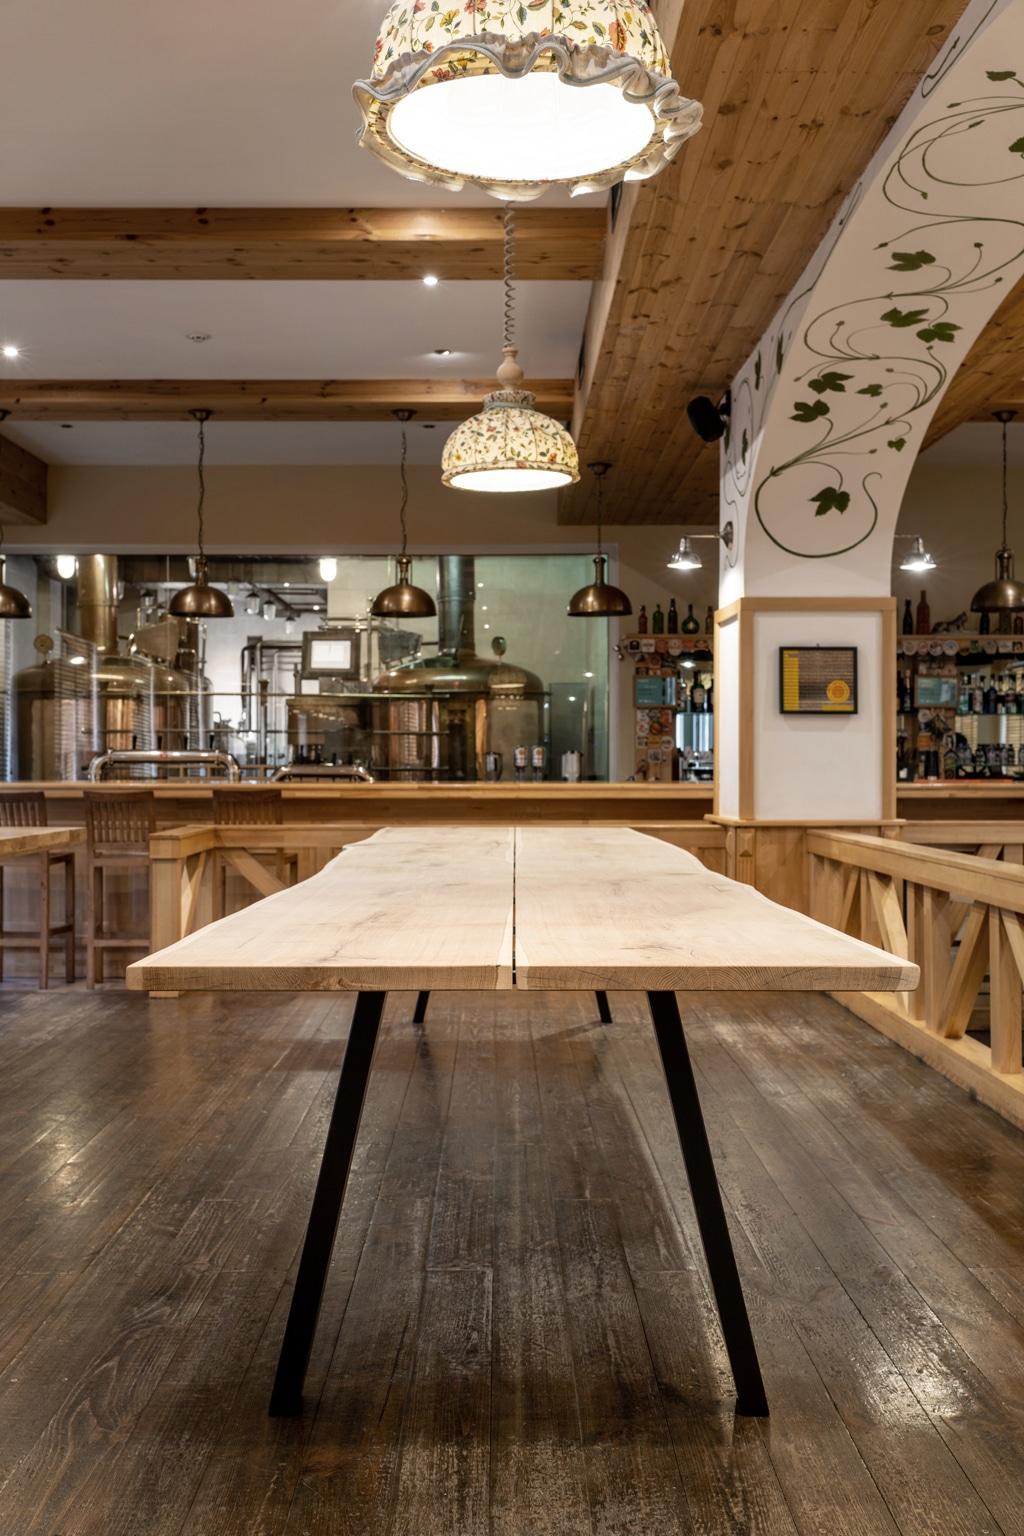 comprar tableros de mesa de madera